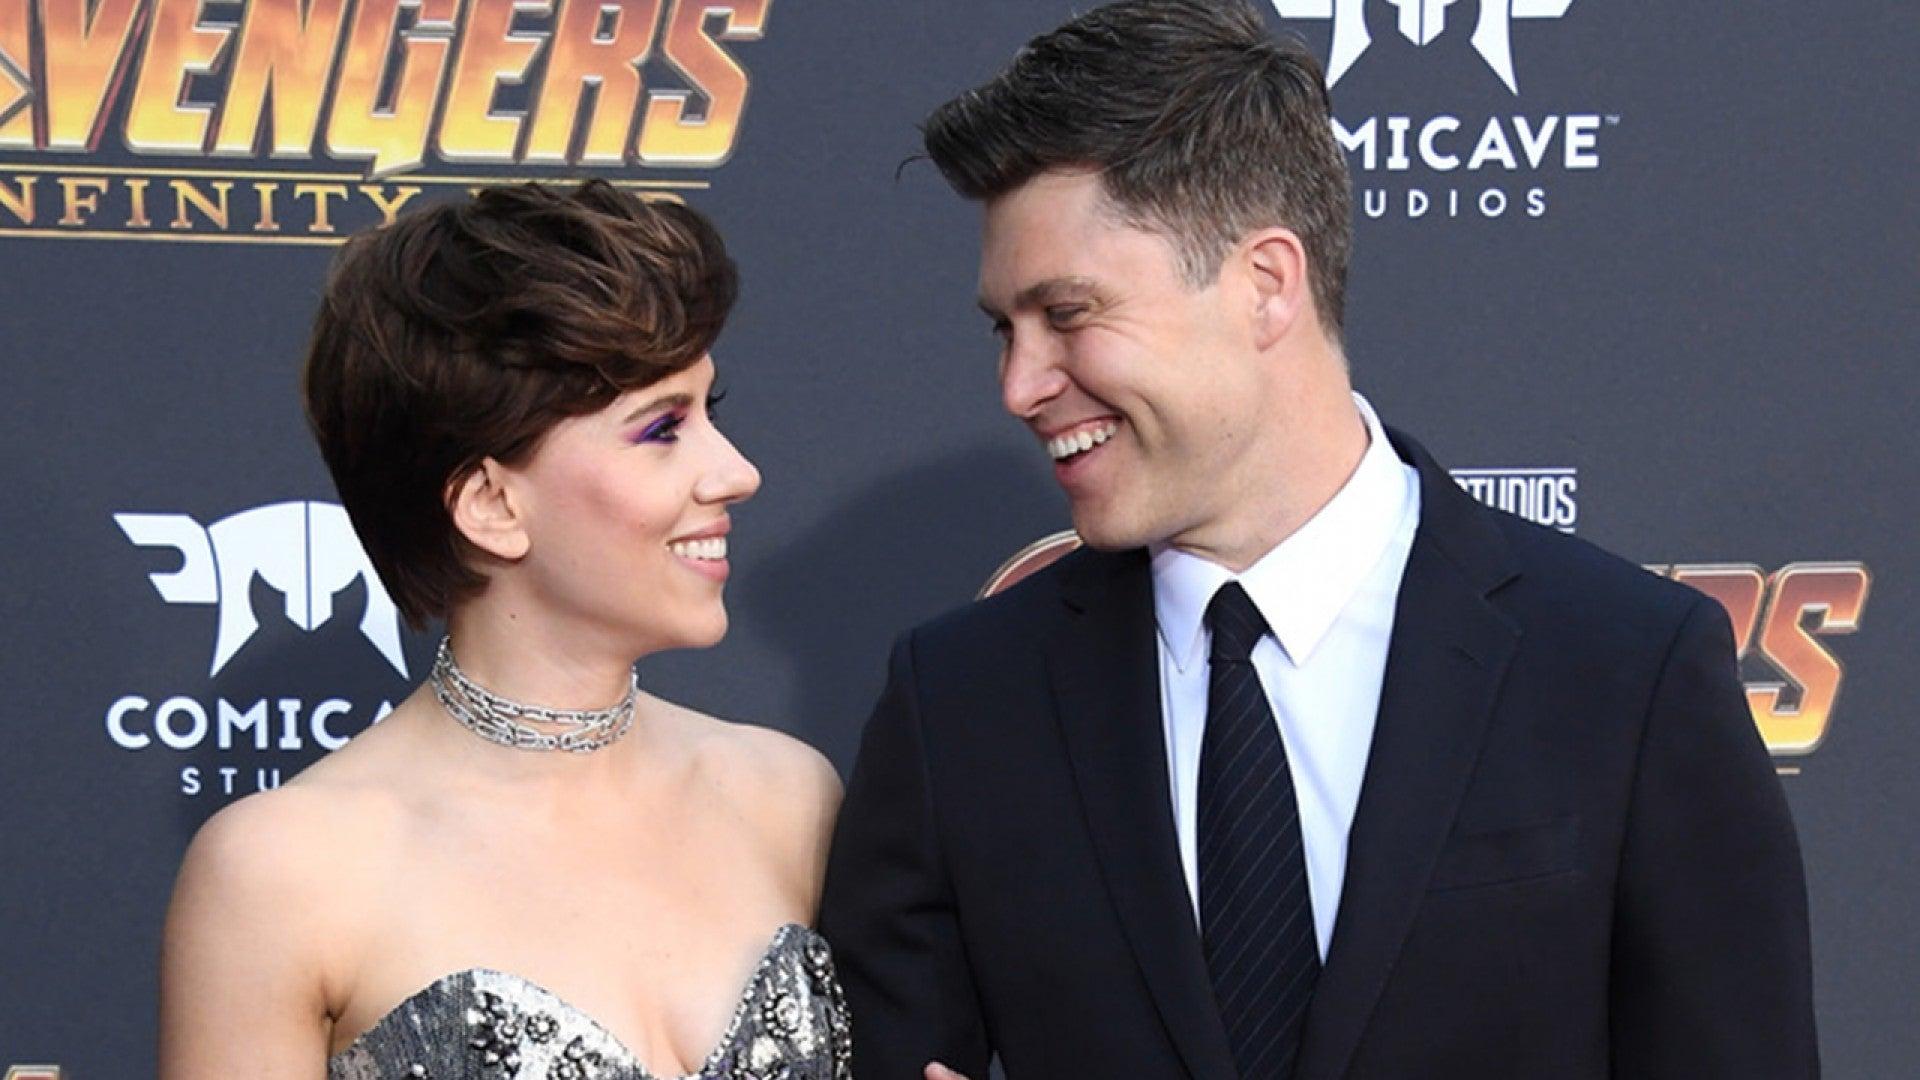 Scarlett Johansson Engaged To Snl Star Colin Jost Entertainment Tonight